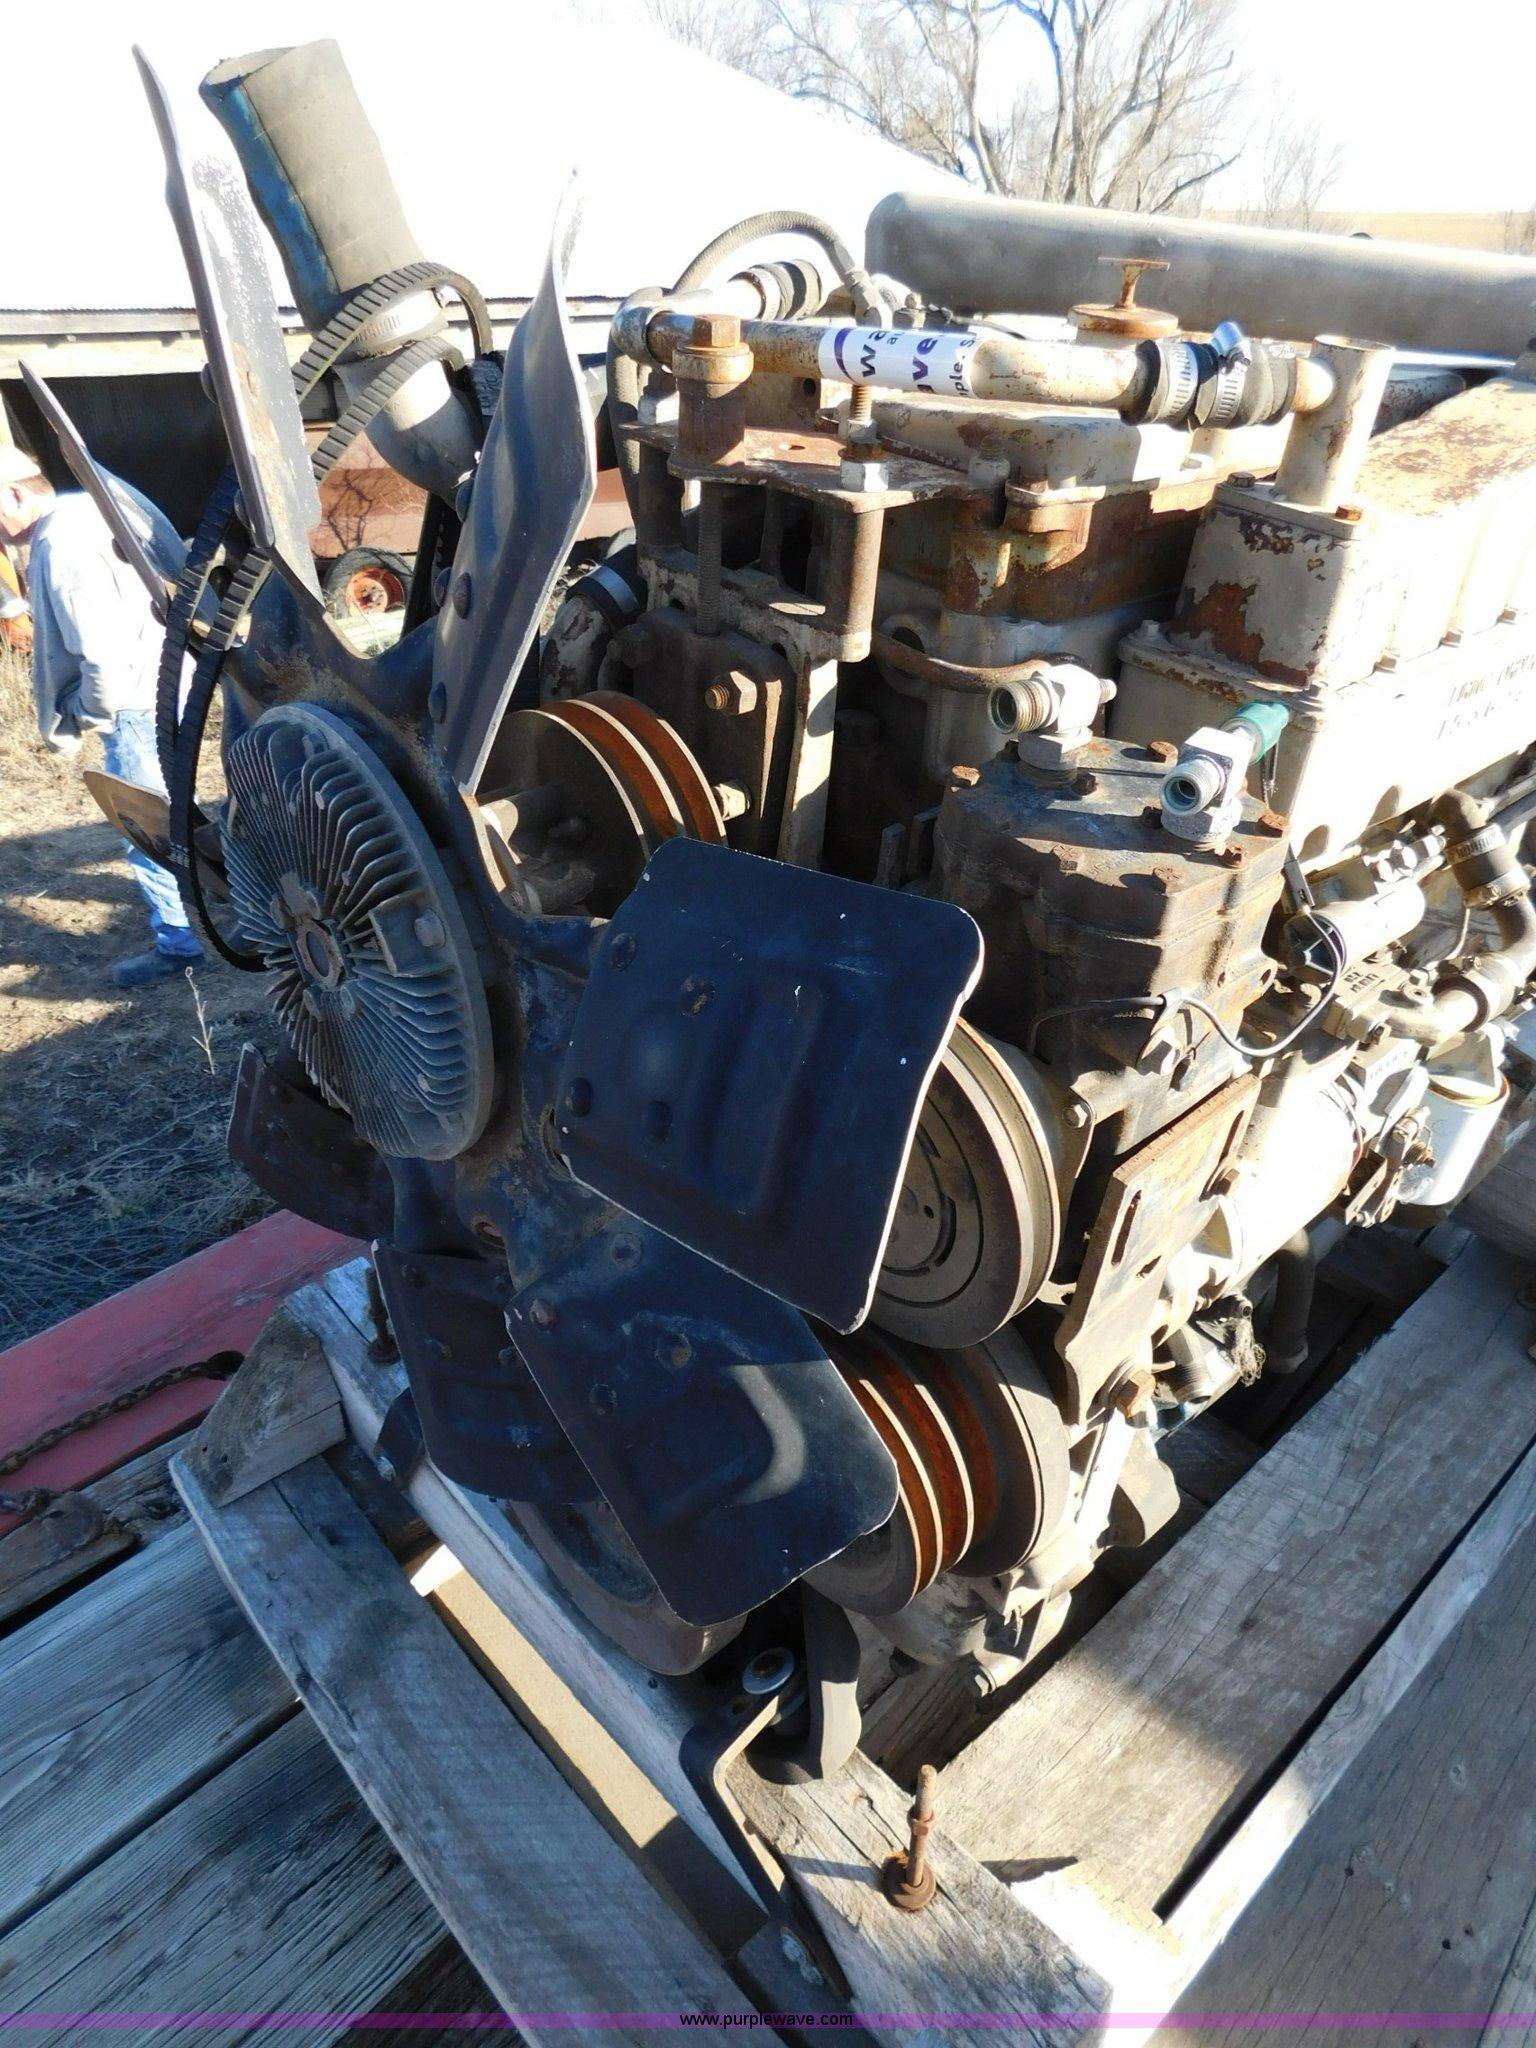 1979 Cummins 855 big cam engine | Item J7412 | SOLD! Februar